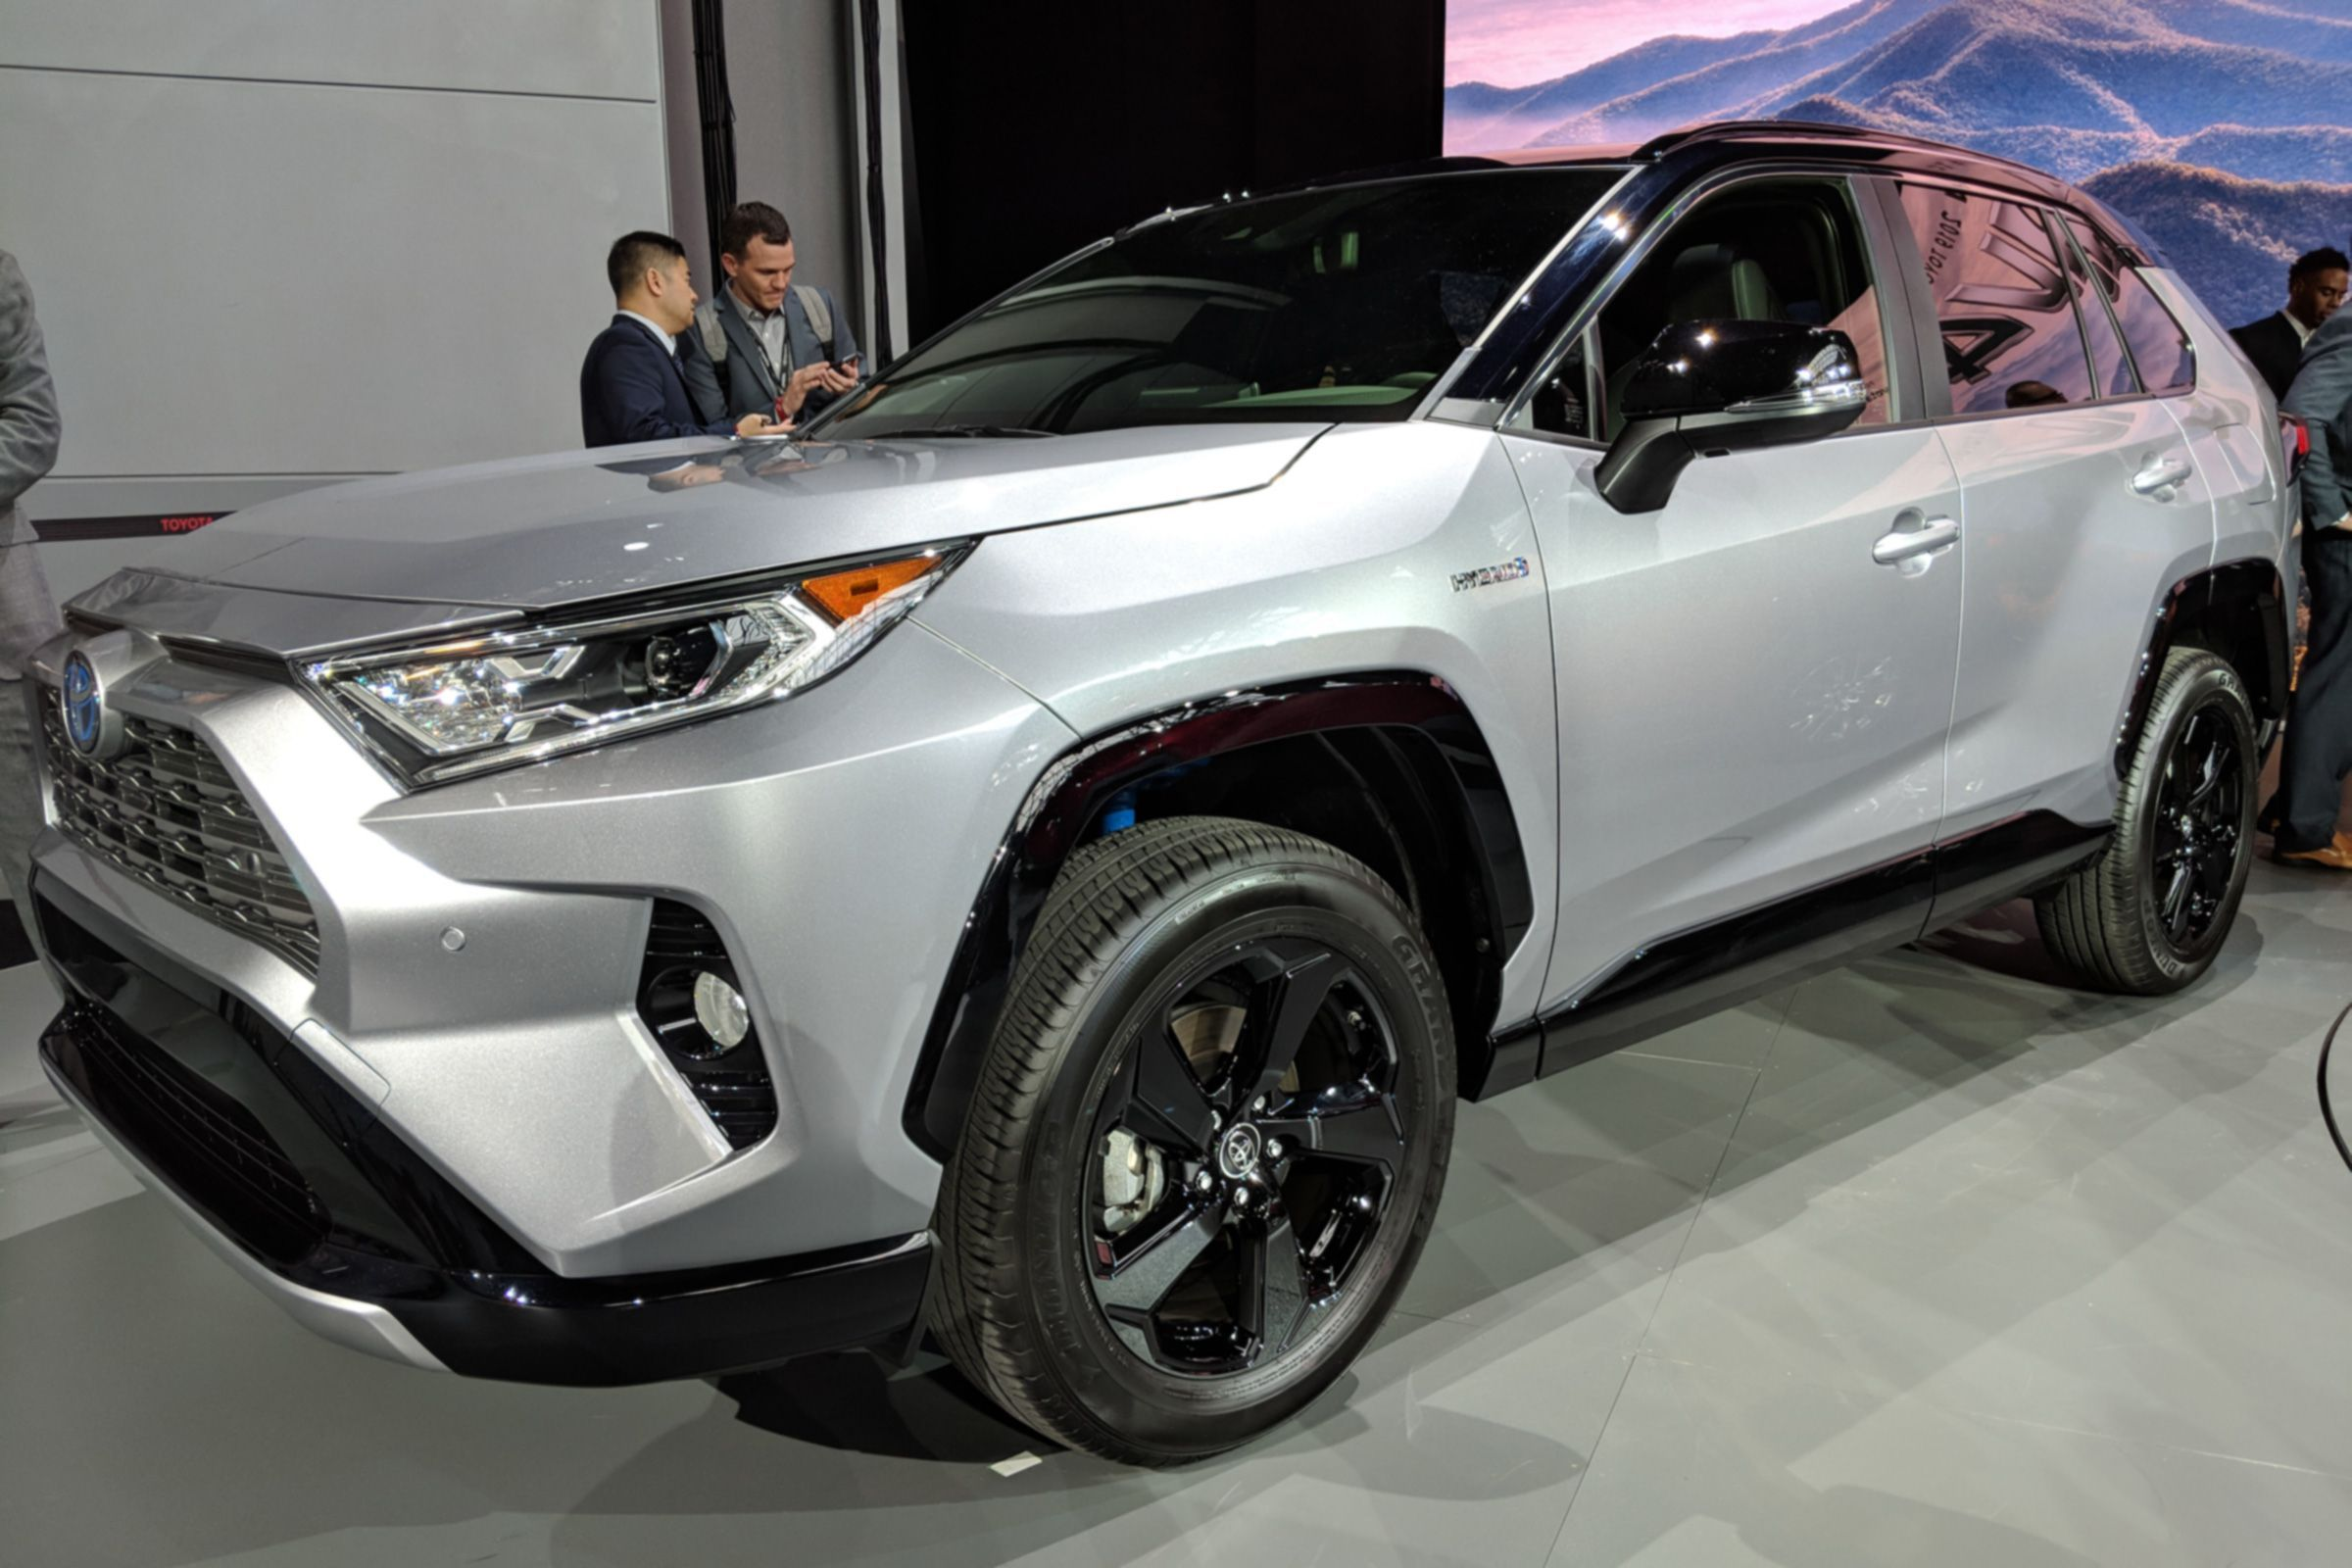 Expert review of the Toyota Rav4 2020 Uk provides the